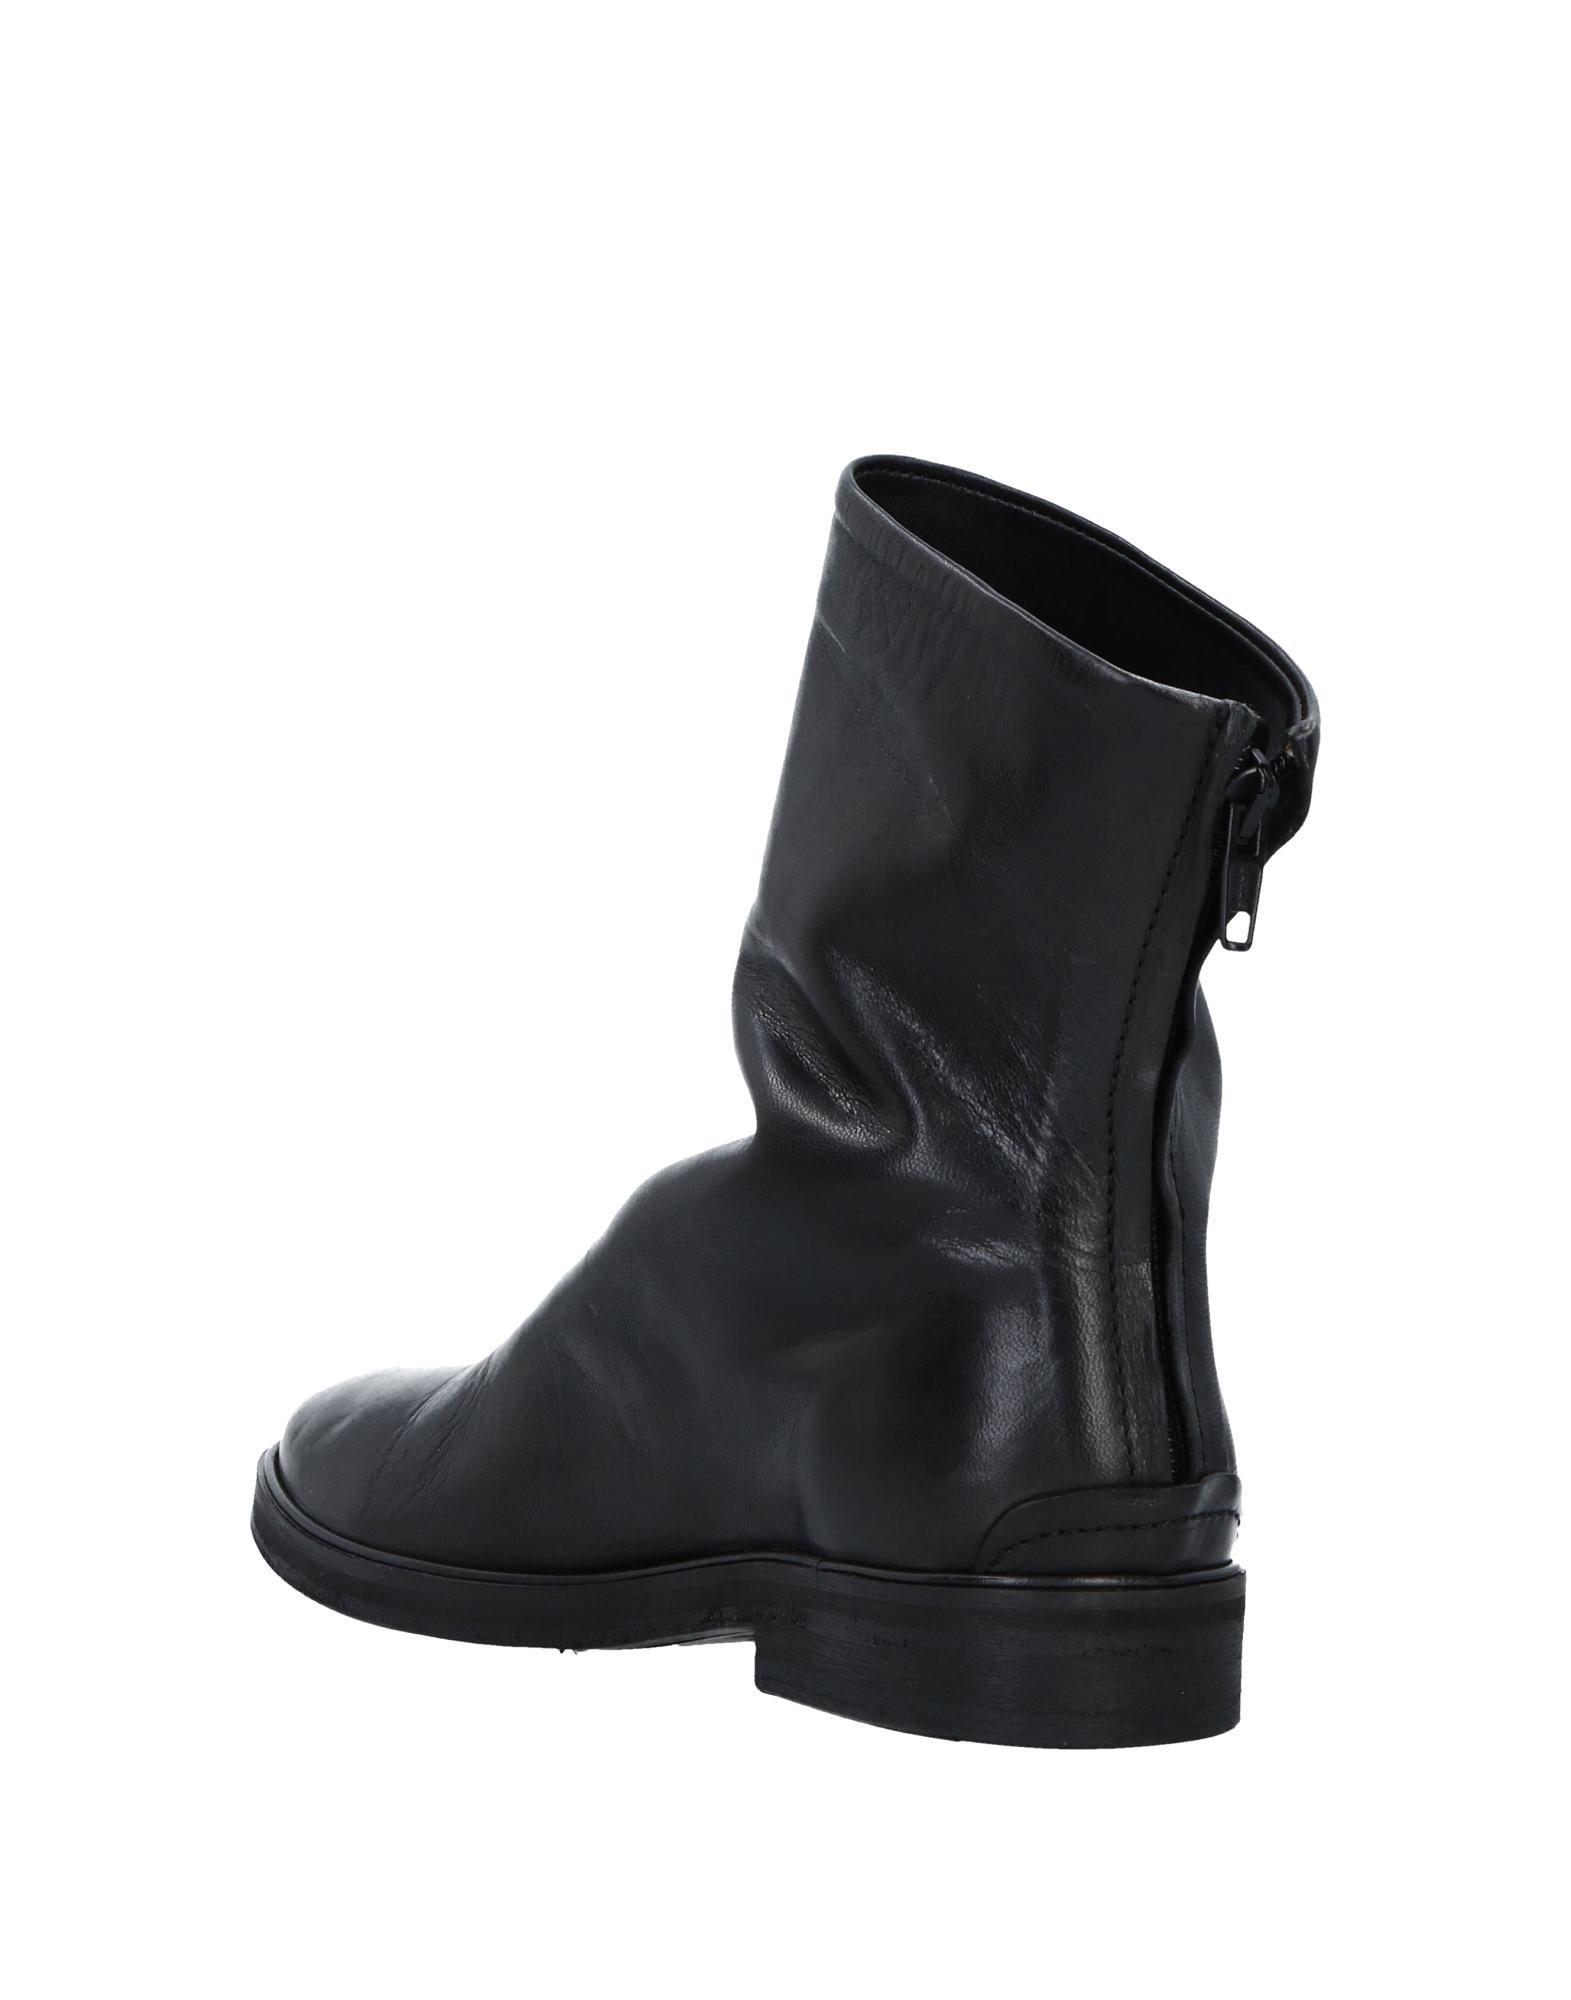 The Last Conspiracy Stiefelette Damen Schuhe  11535796OSGut aussehende strapazierfähige Schuhe Damen 7f221e